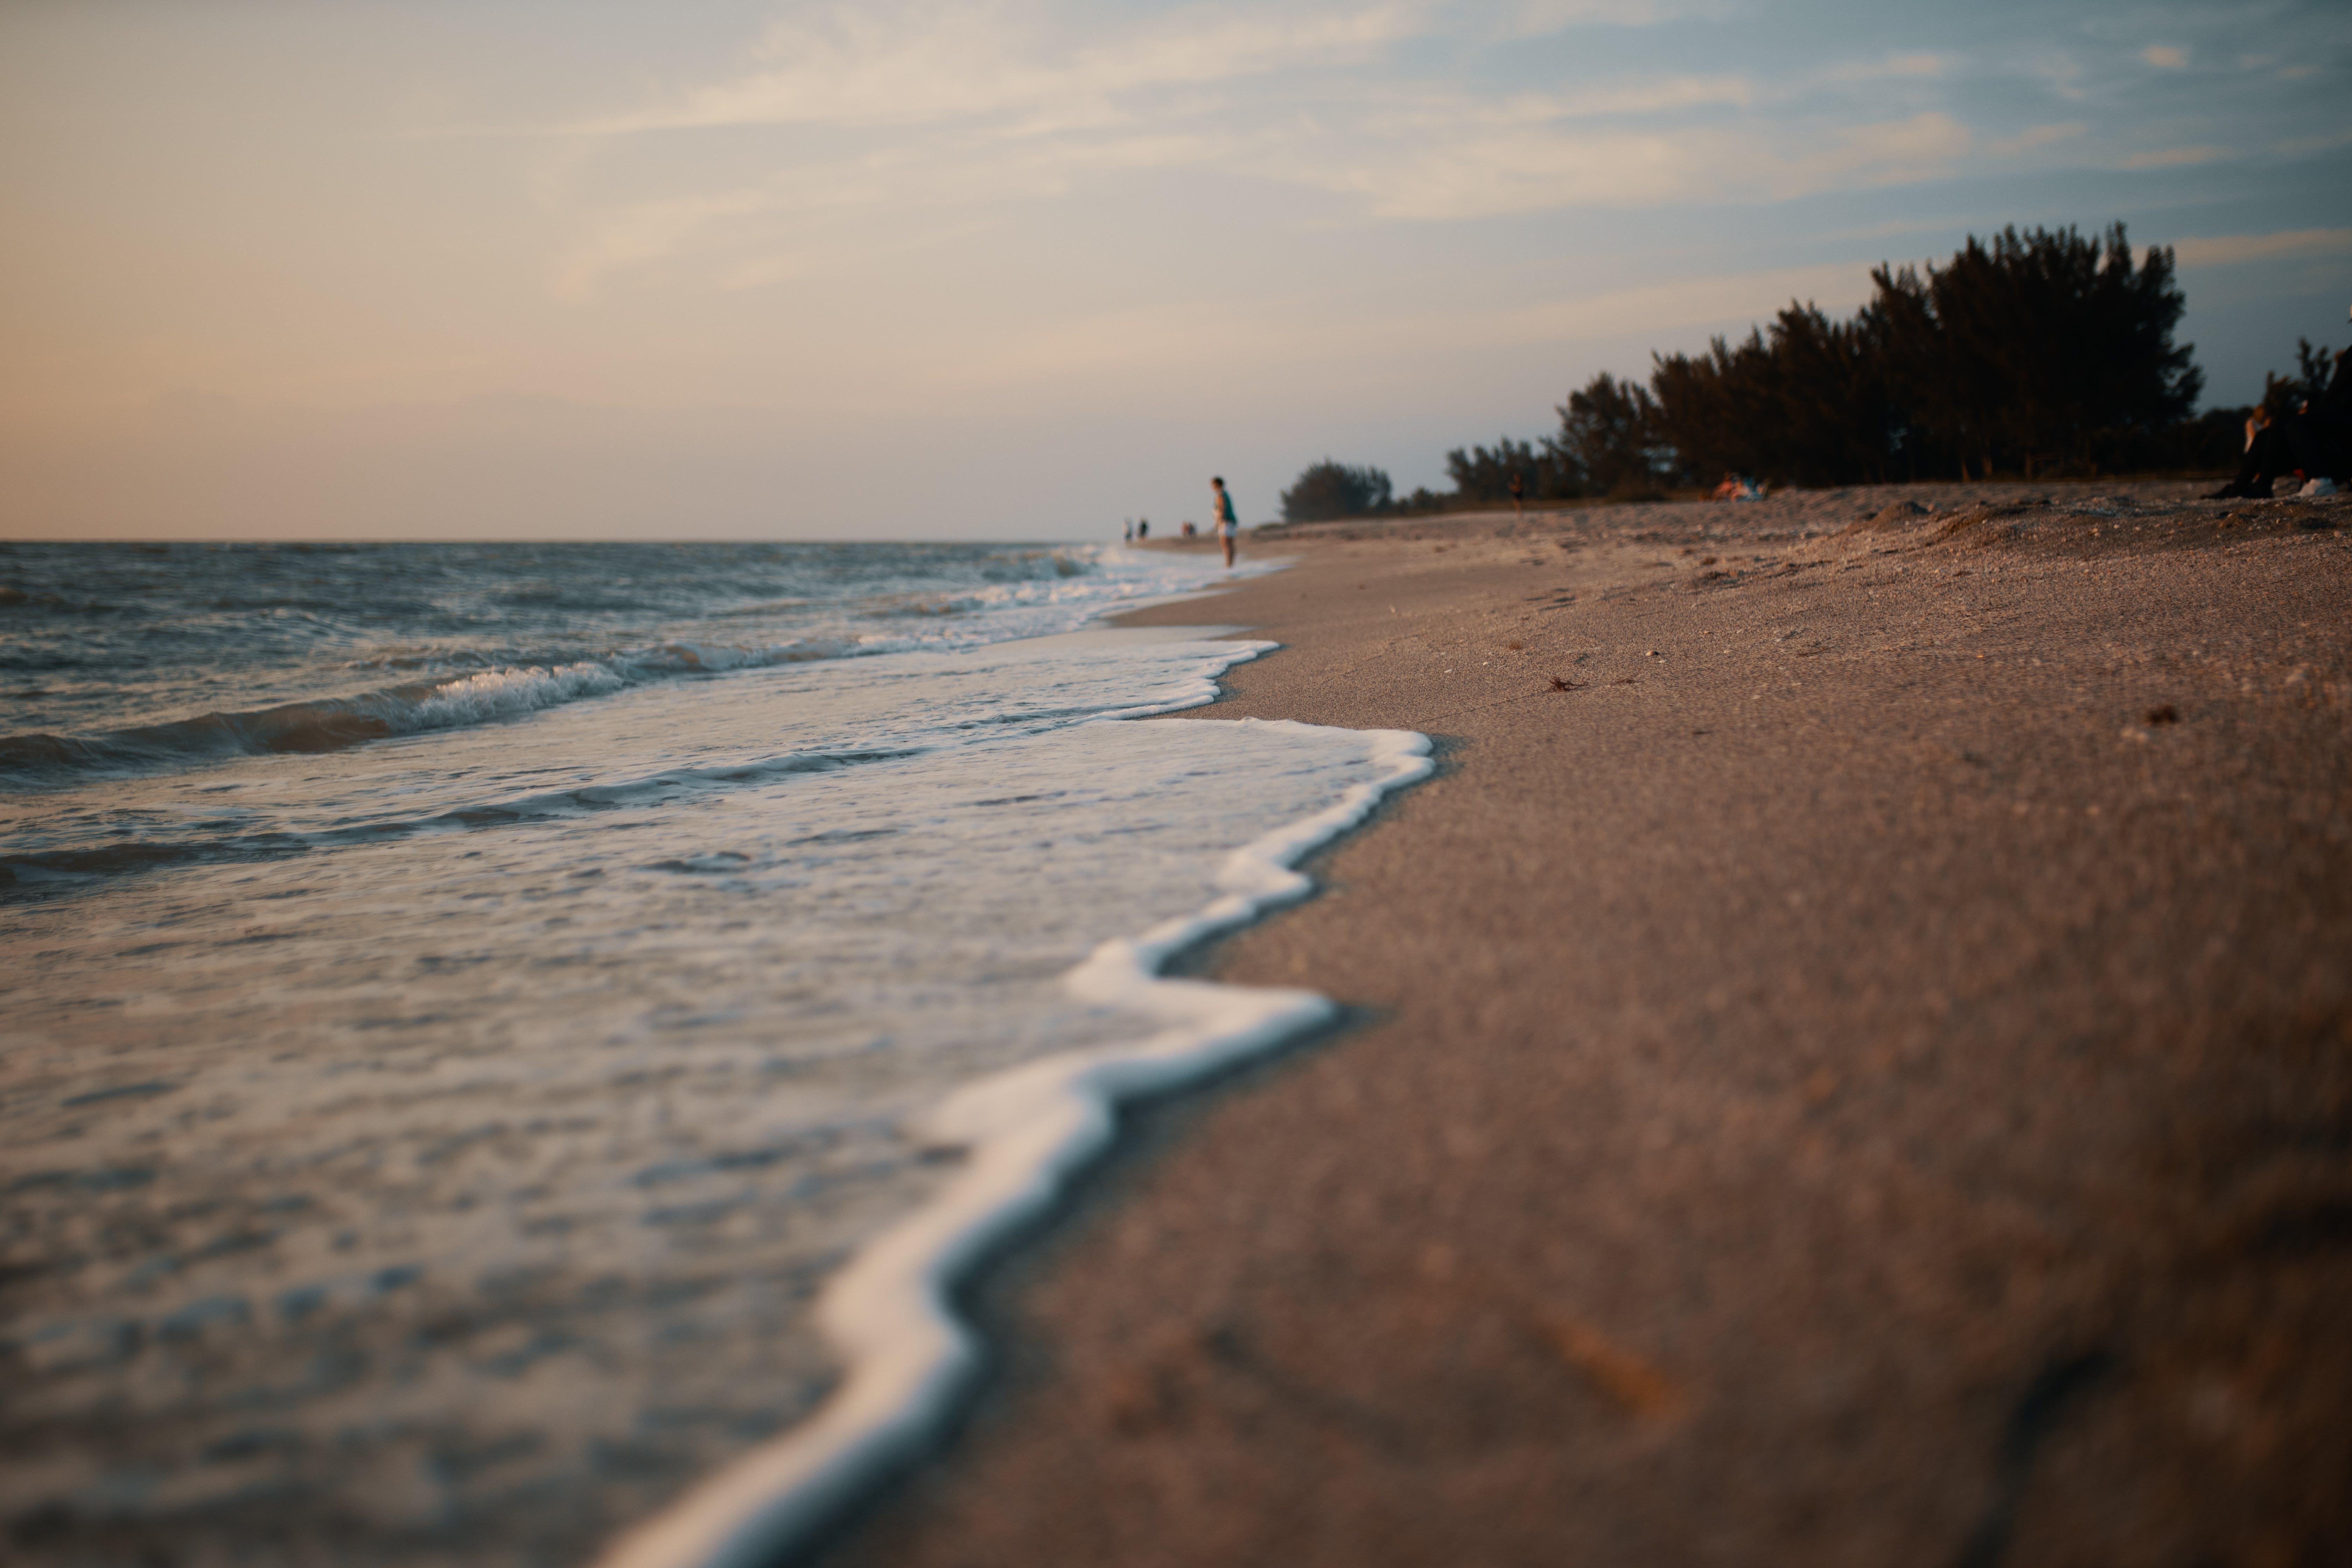 Fotos de stock gratuitas de arena, costa, litoral, mar